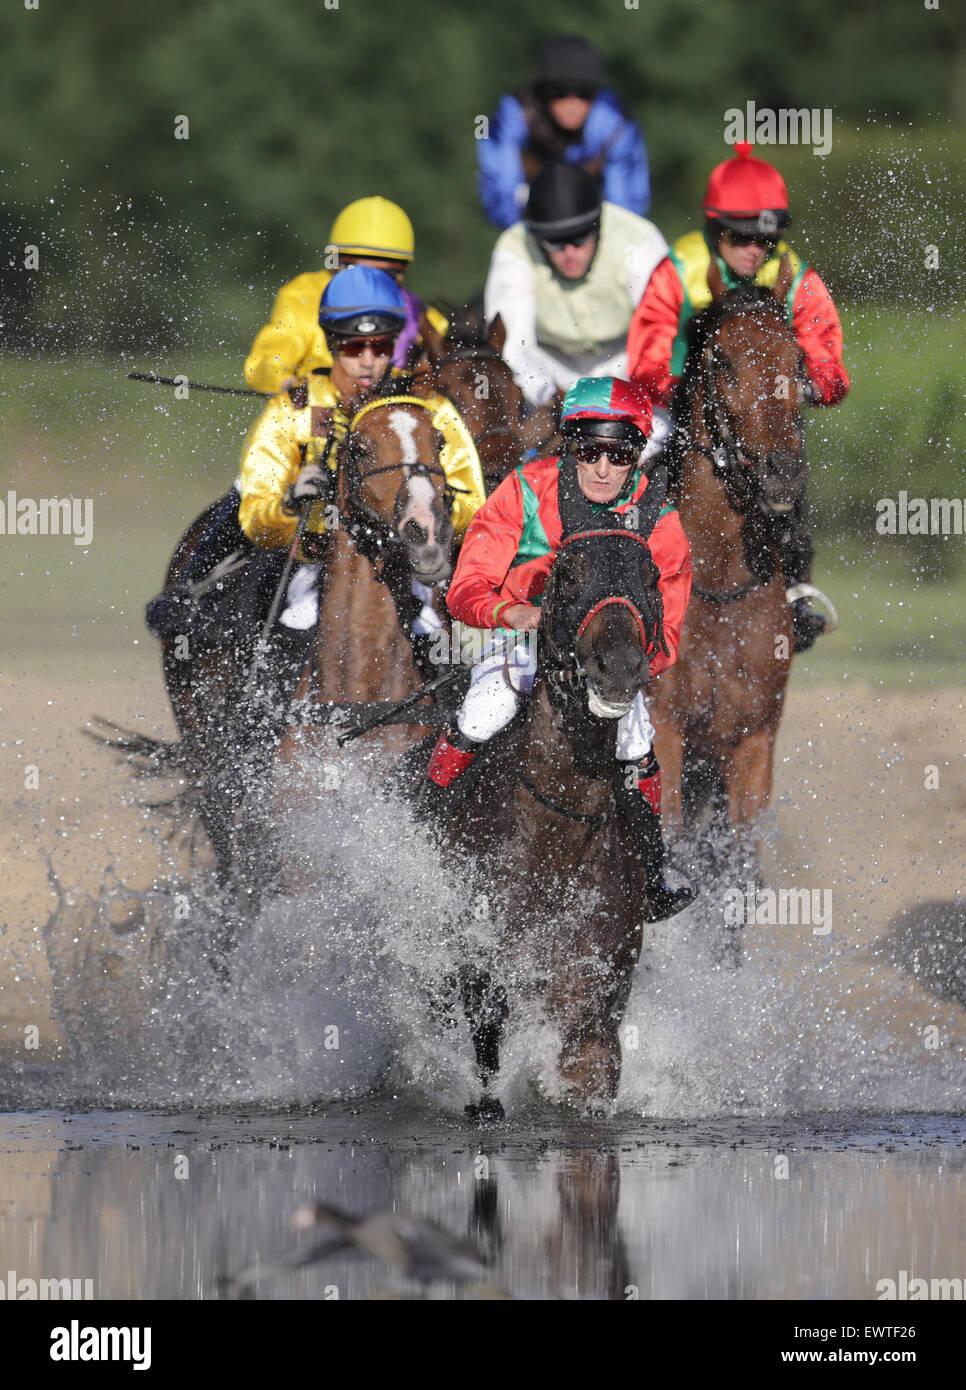 Hamburg, Germany. 30th June, 2015. Equastrian Vlastislav Korytar on his horse Audientia leads the field of jockeys - Stock Image